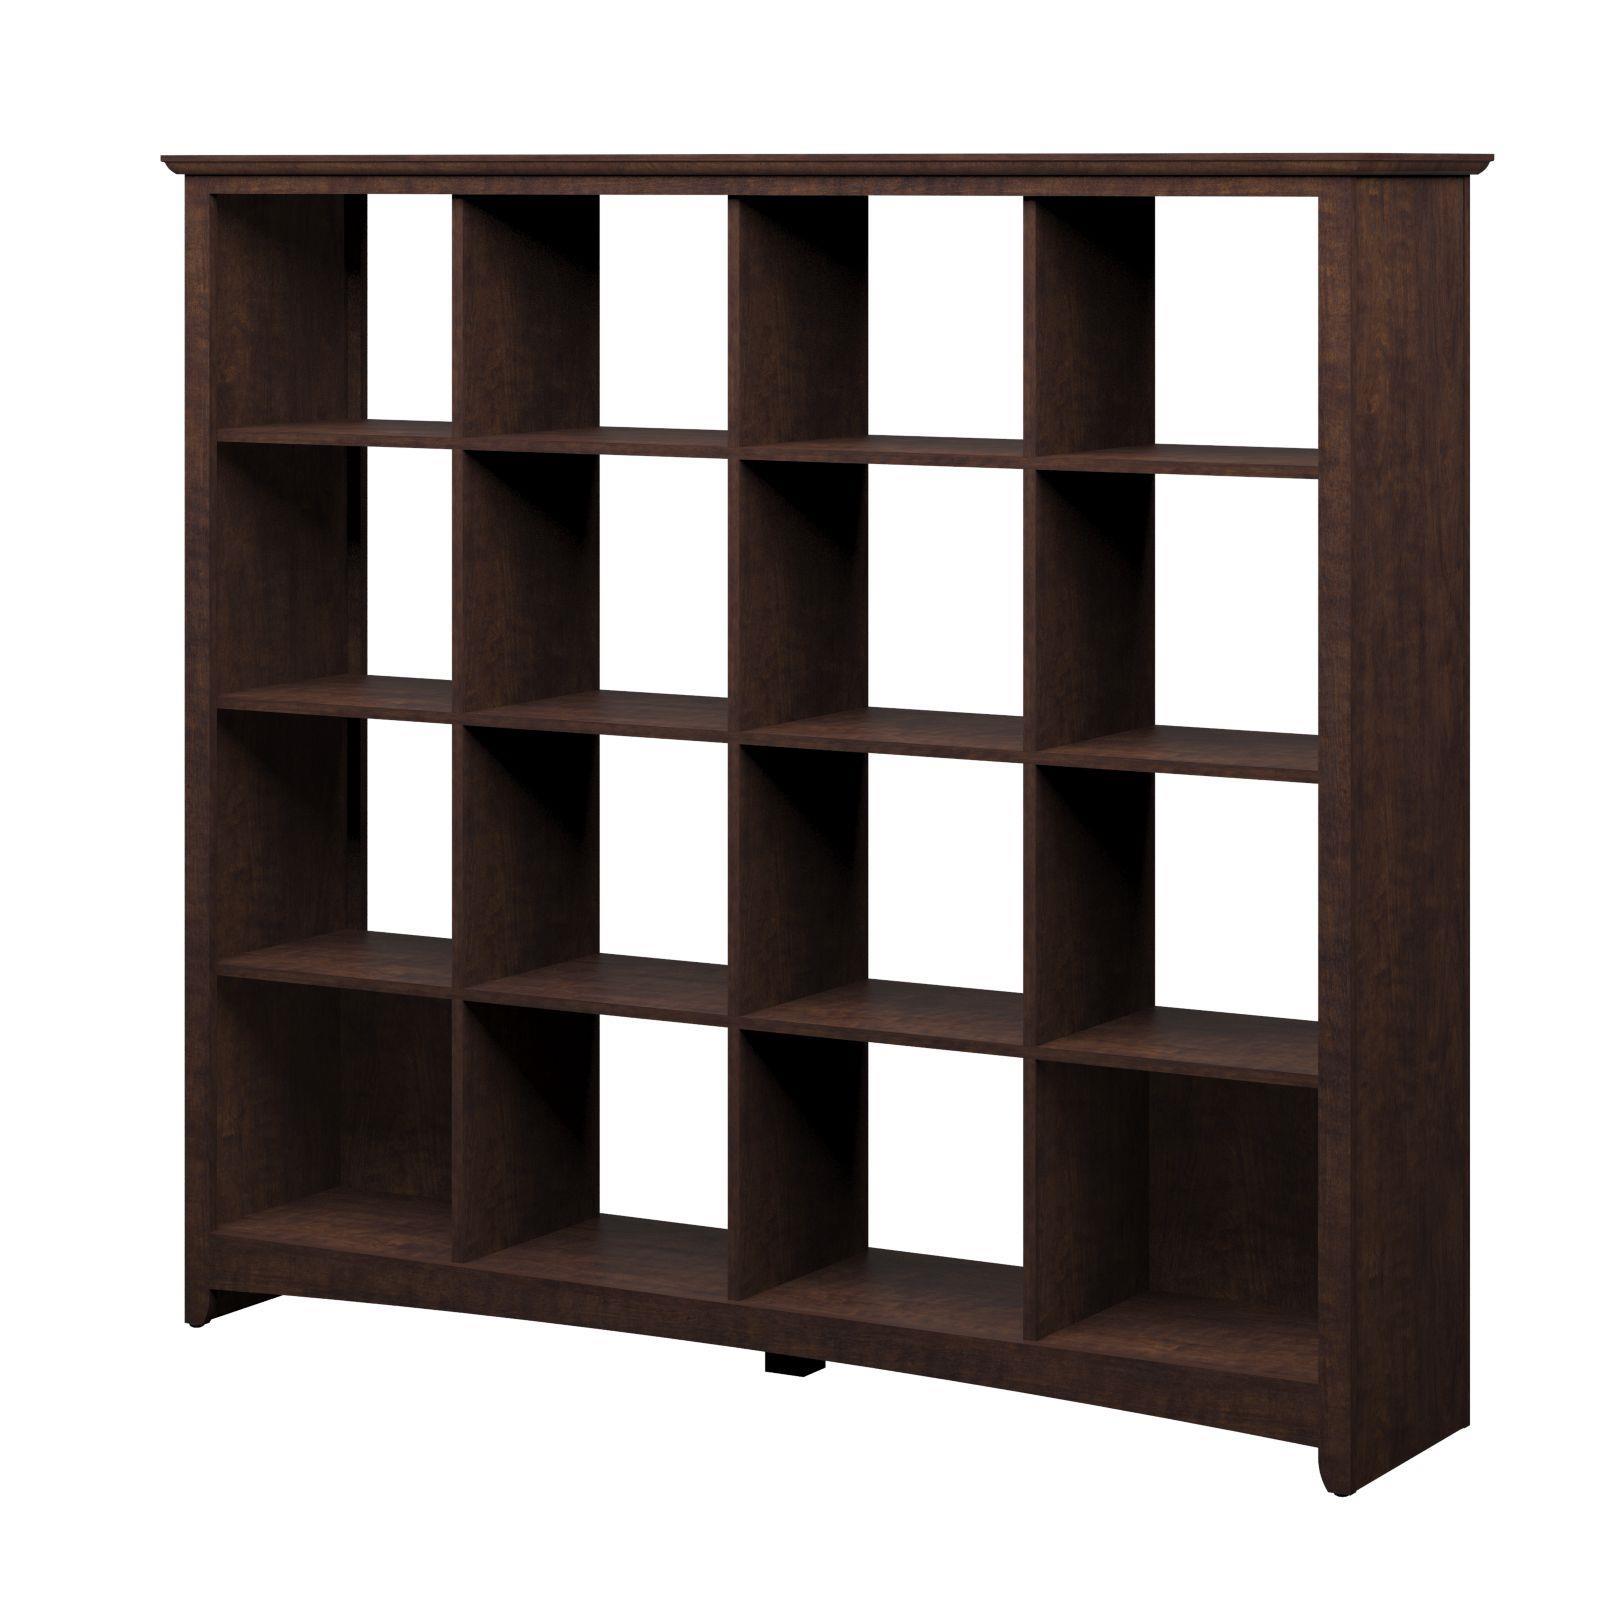 Bush furniture buena vista 16 cube bookcase room divider for Storage furniture